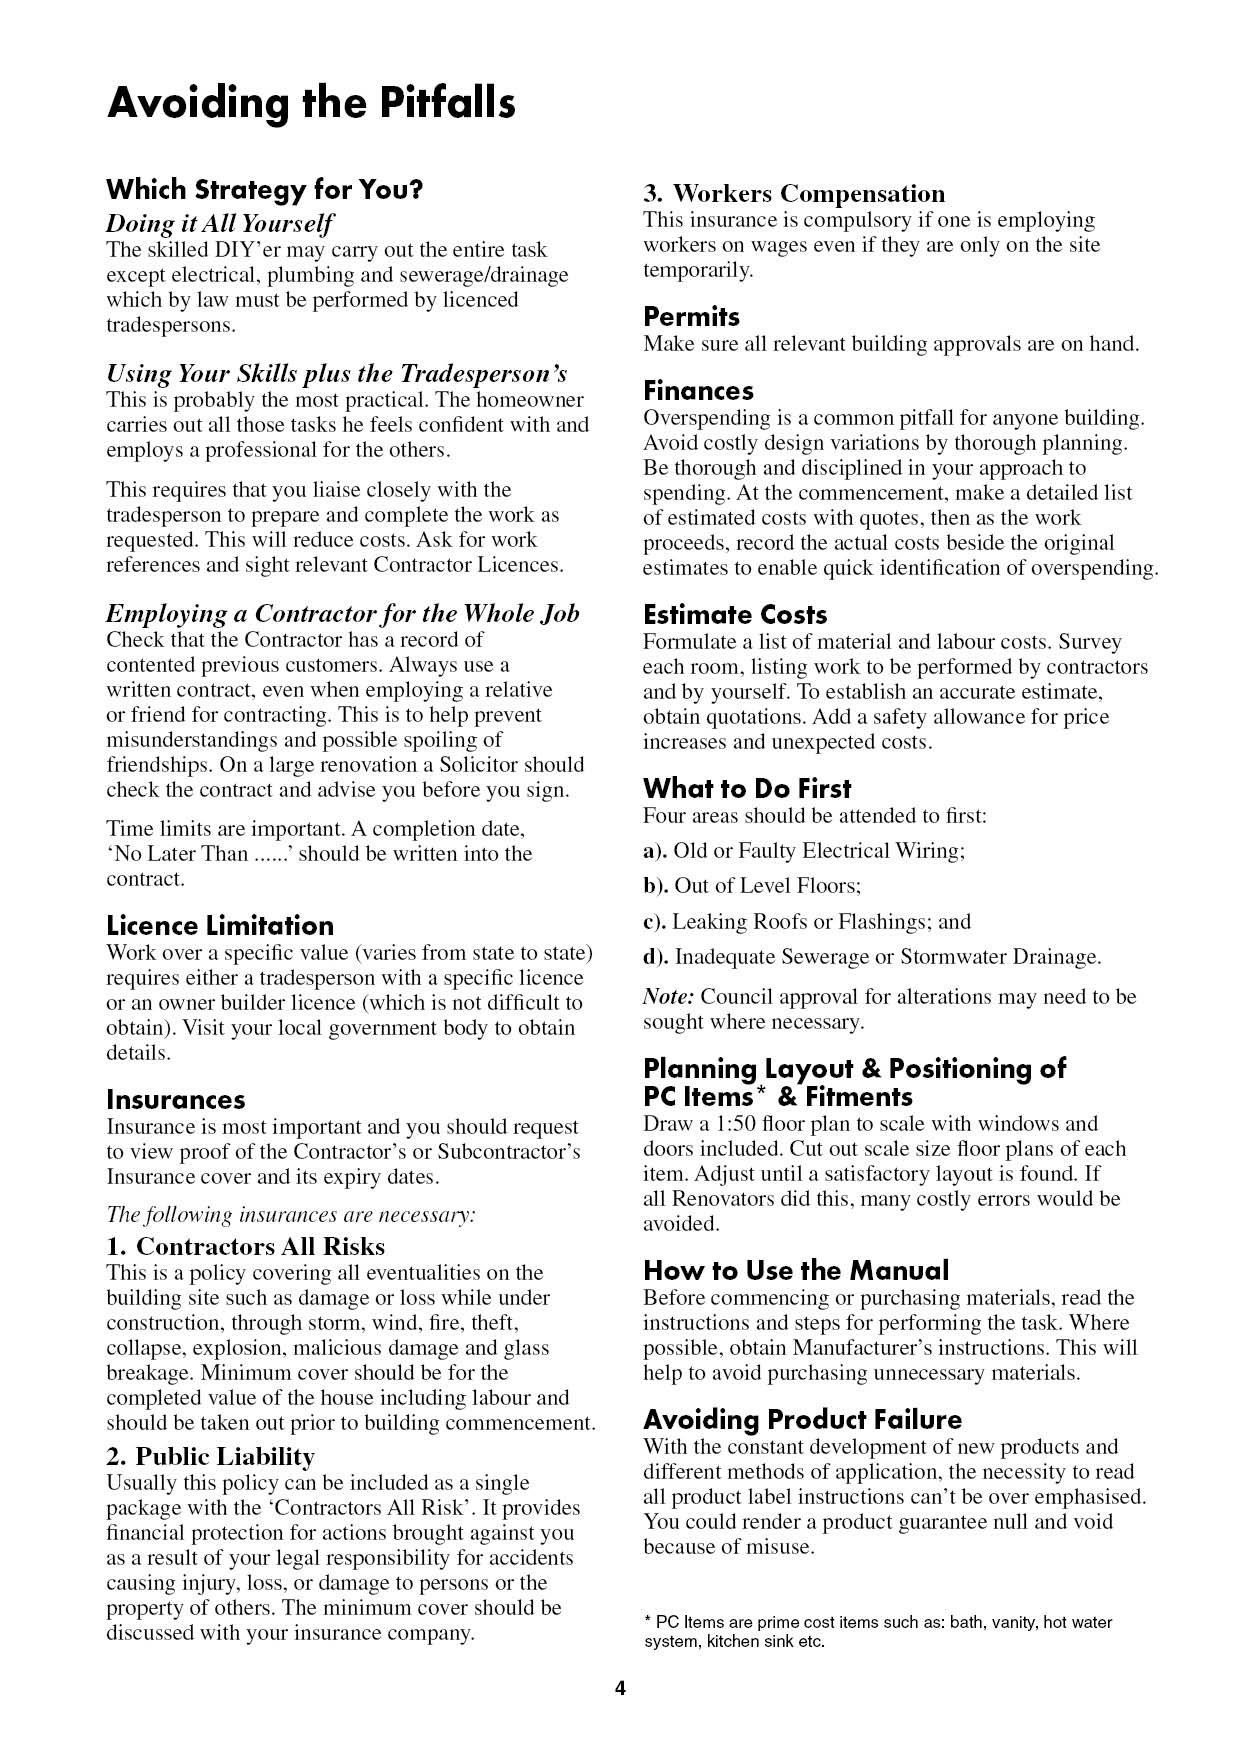 The australian renovators manual allan staines the australian renovators manual 7th edition allan staines solutioingenieria Gallery